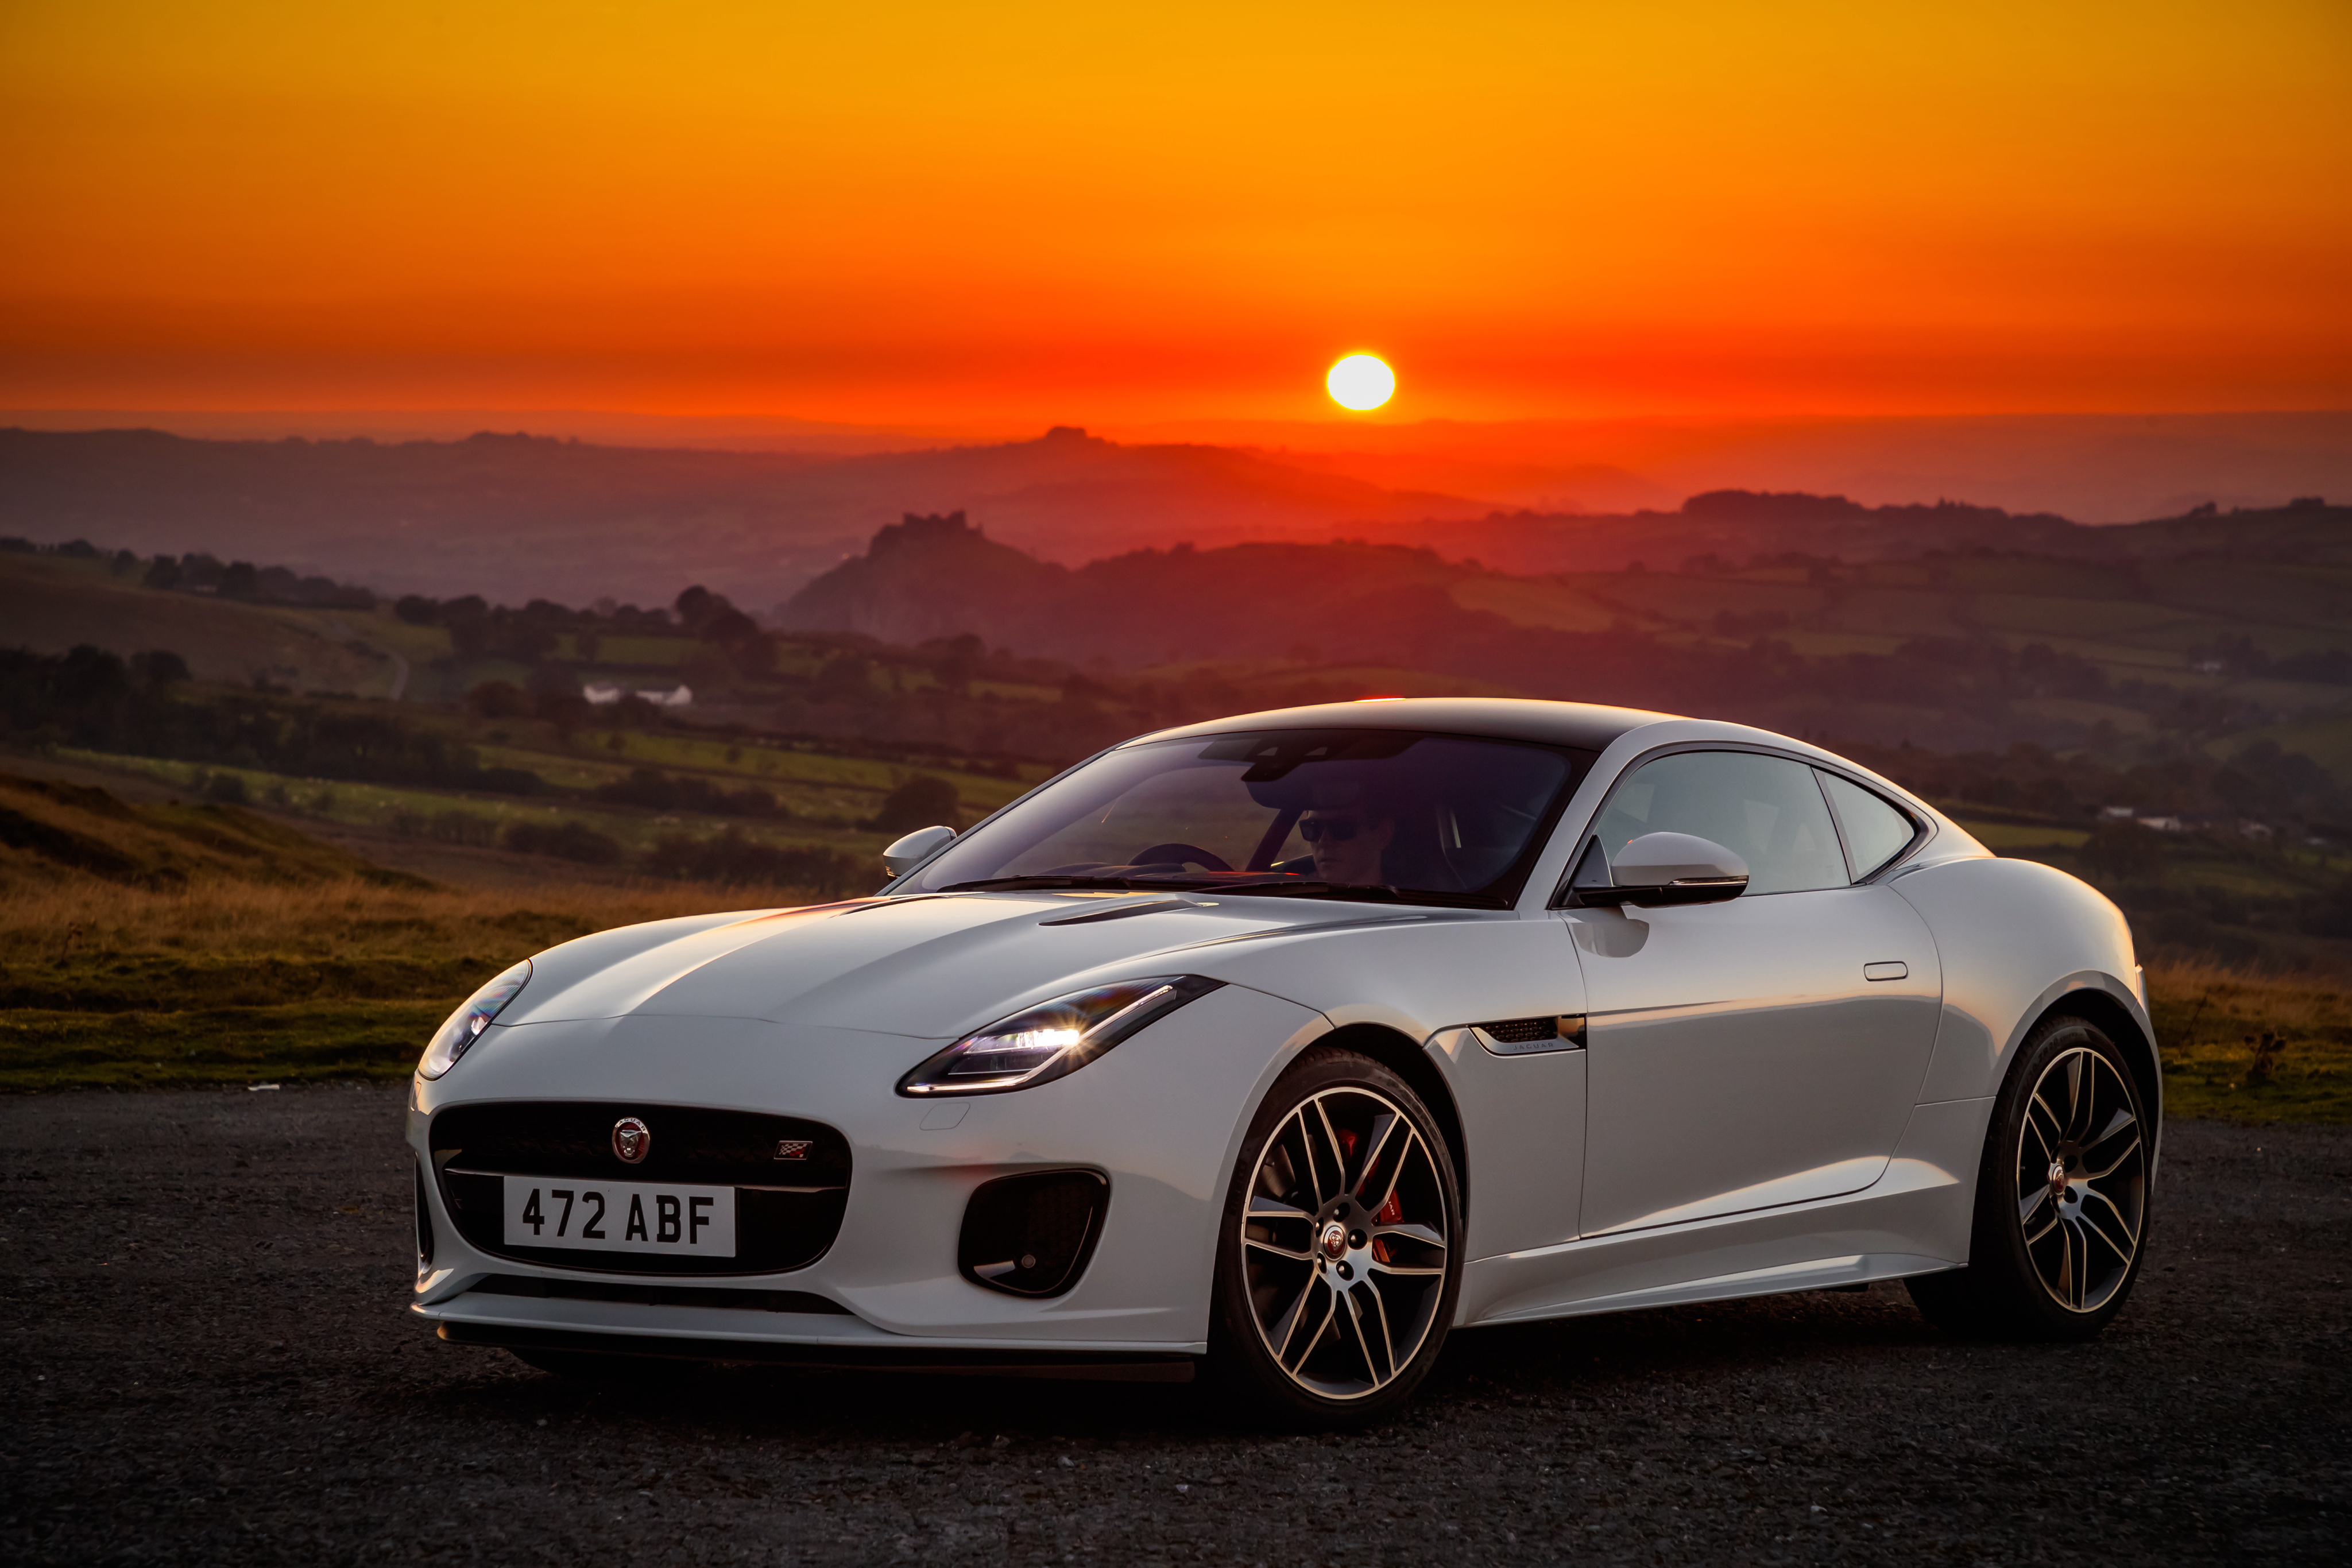 Jaguar F Type 4k Ultra Fondo De Pantalla Hd Fondo De